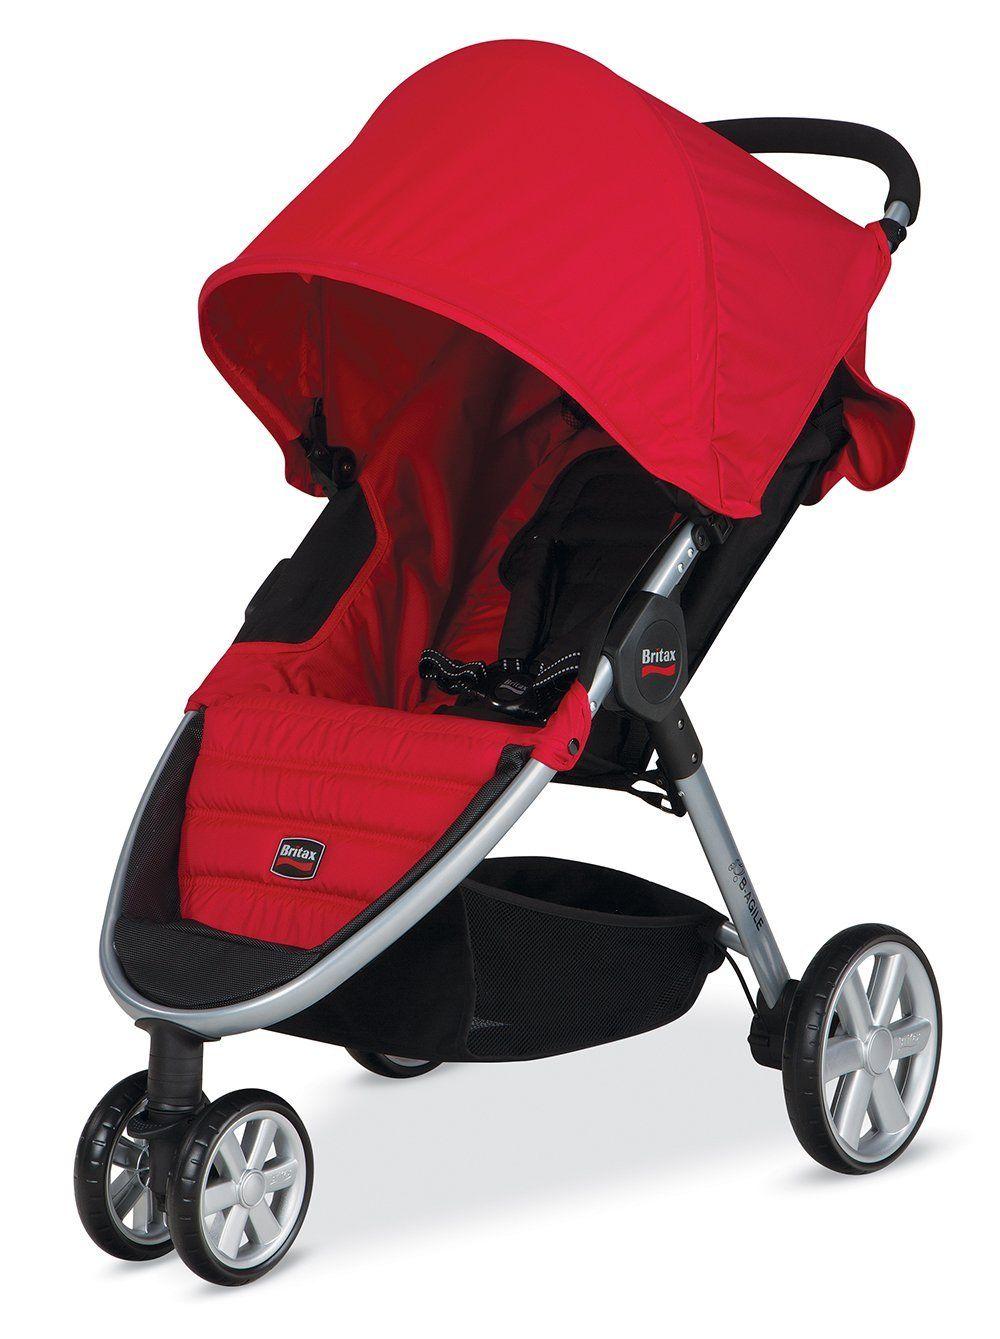 37+ Britax b agile stroller double information